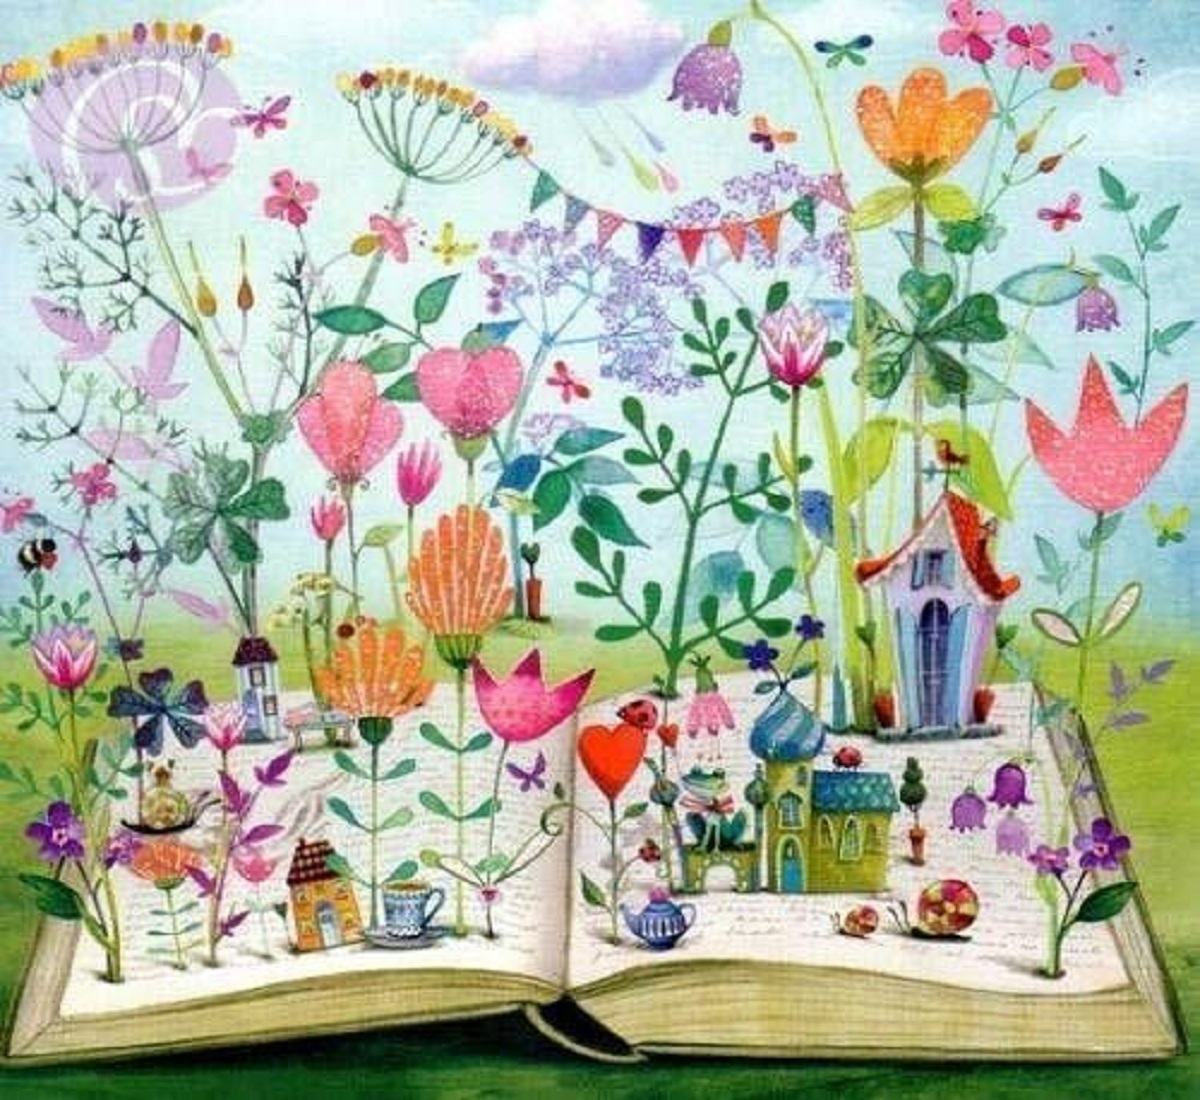 libri da leggere a marzo